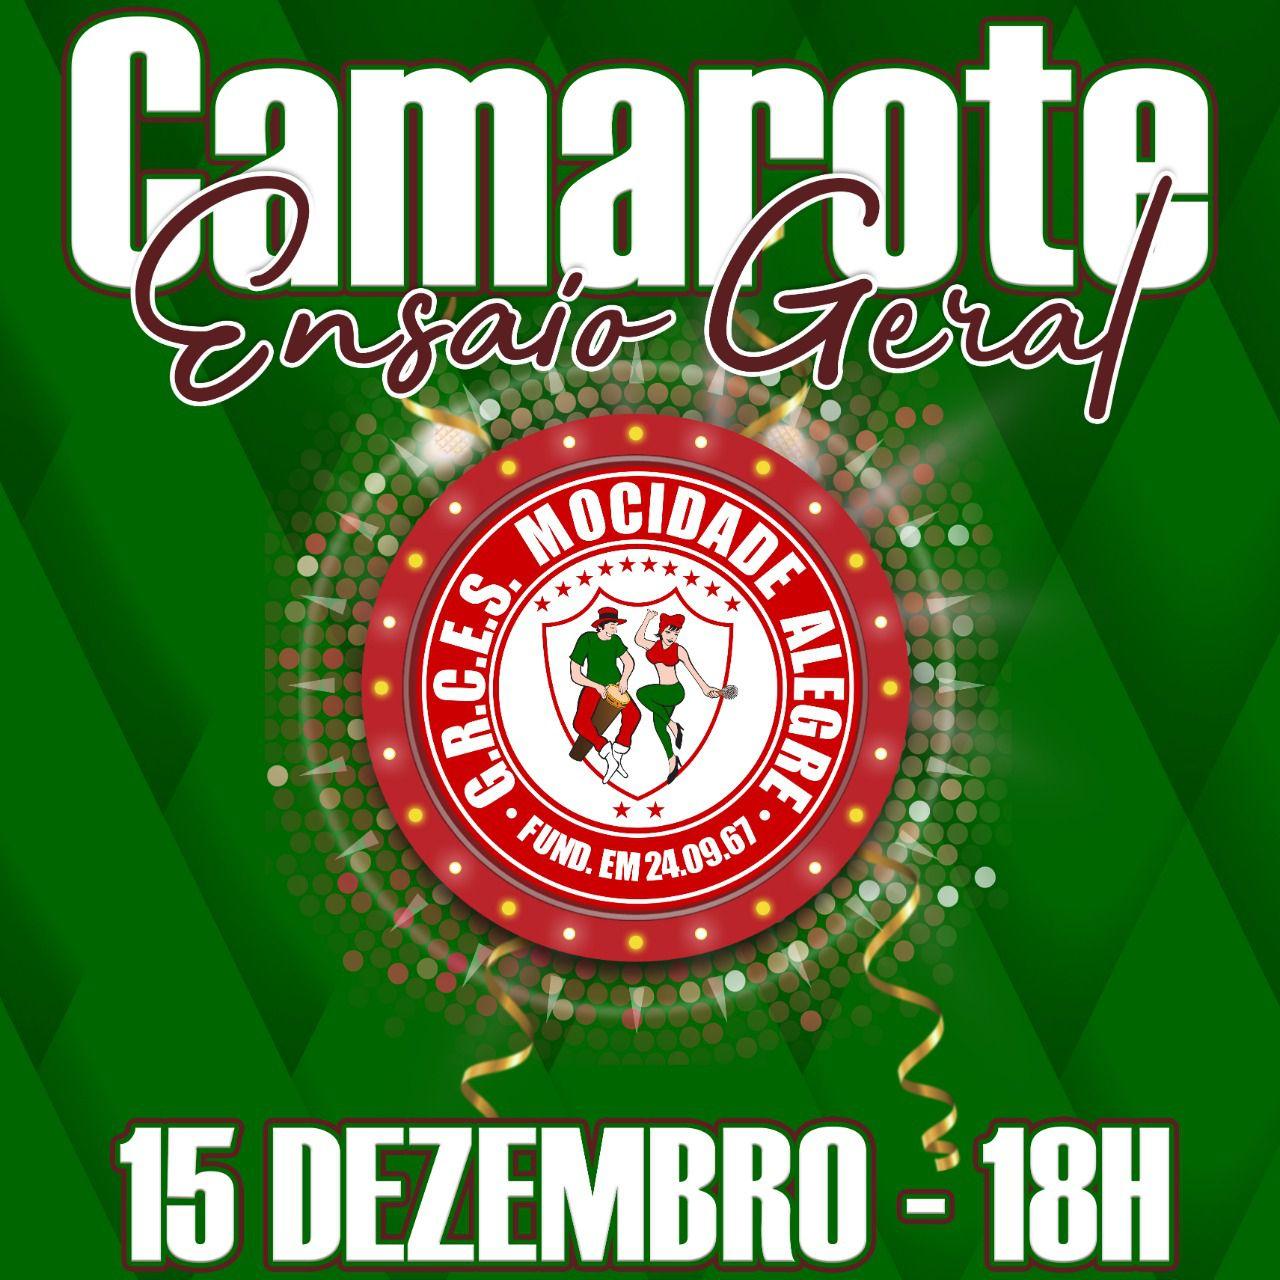 CAMAROTE - 15-12-2019 - ENSAIO GERAL  - Mocidade Alegre